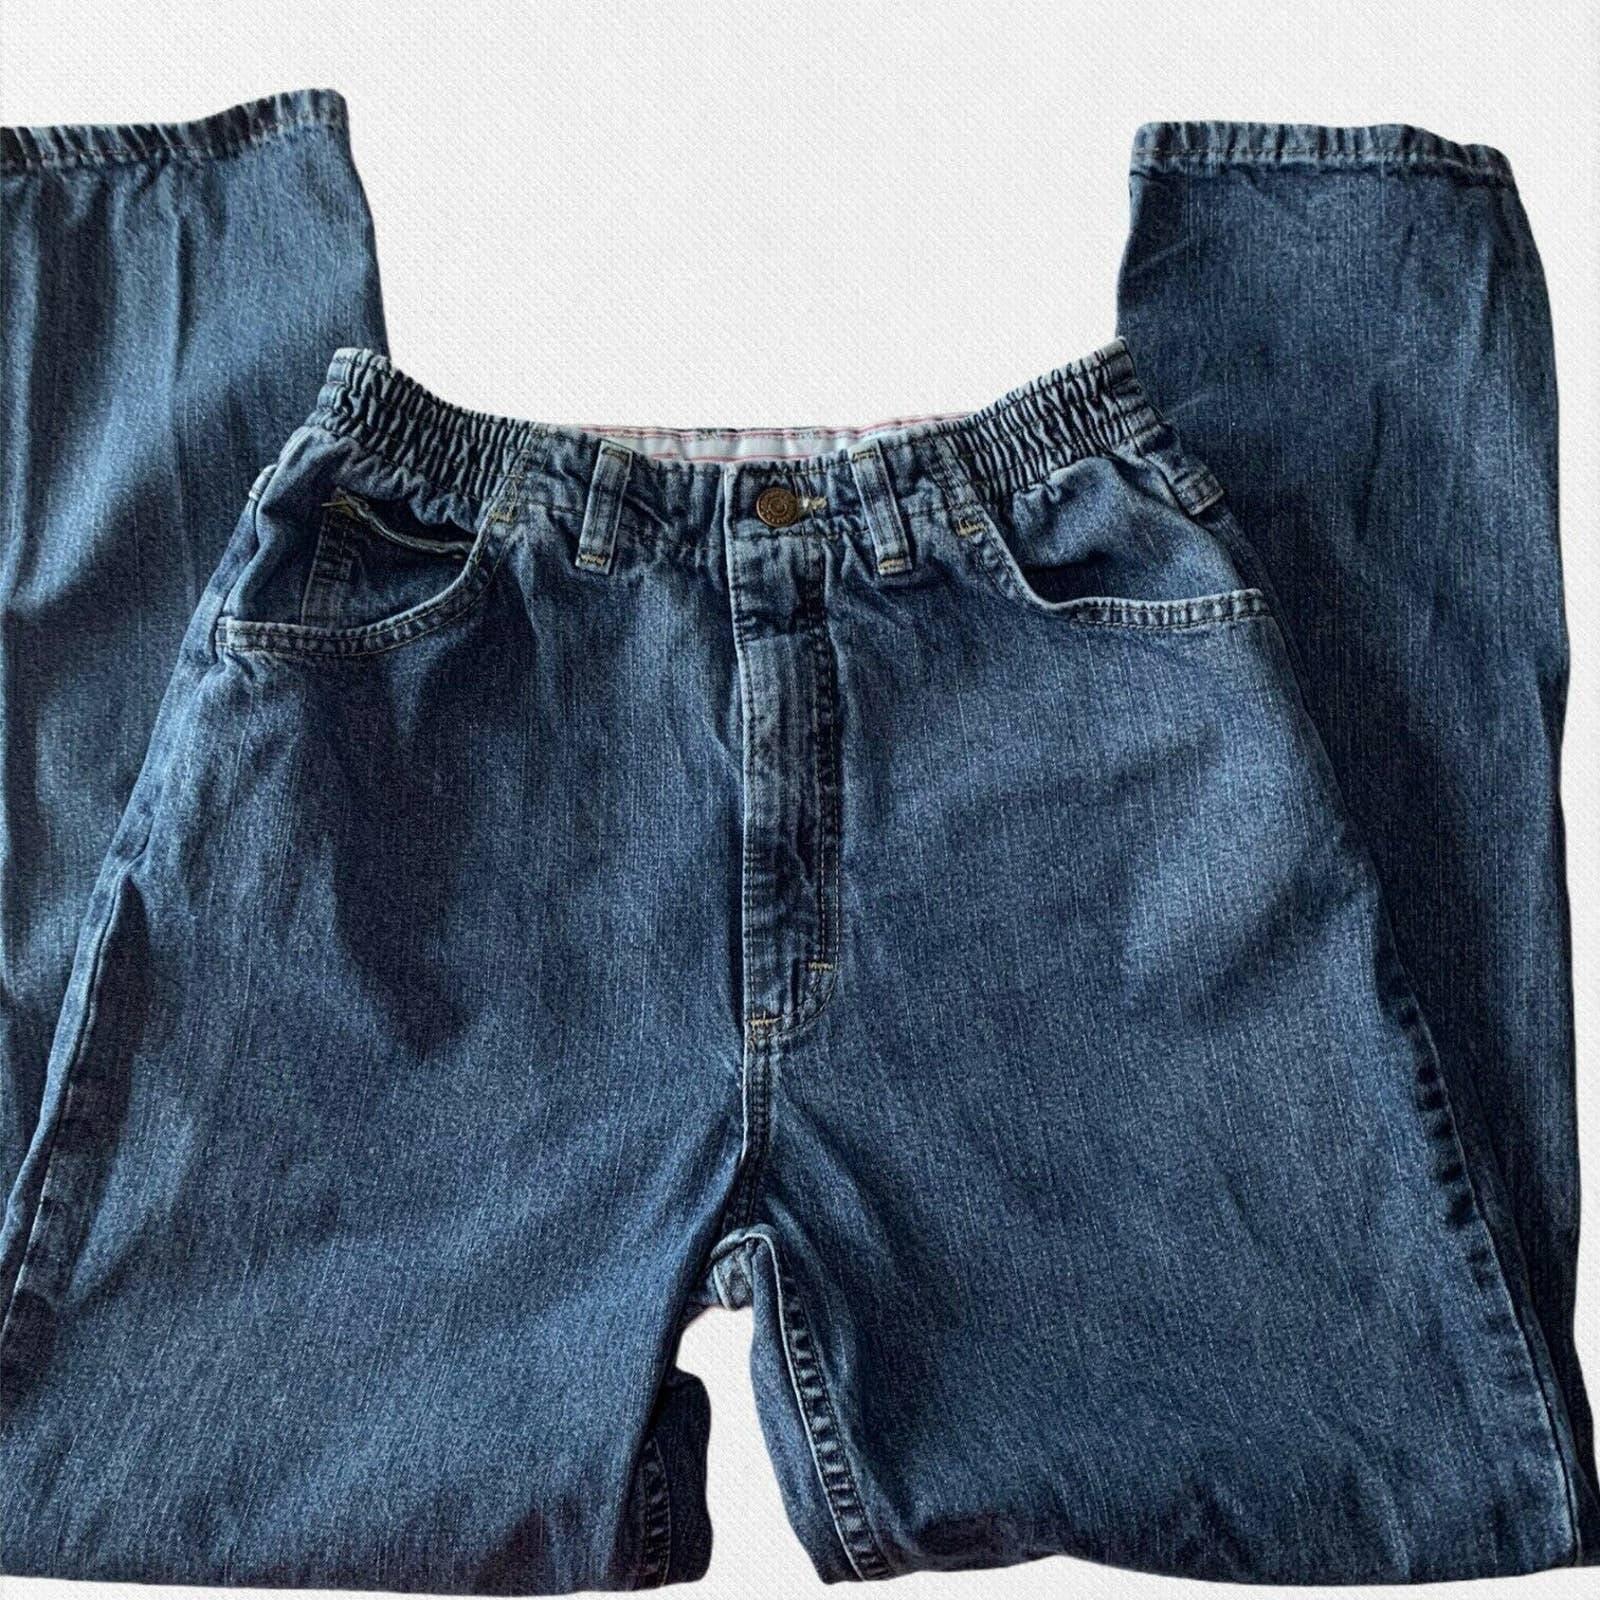 Lee High Rise Mom Jeans Sz 26 Vintage